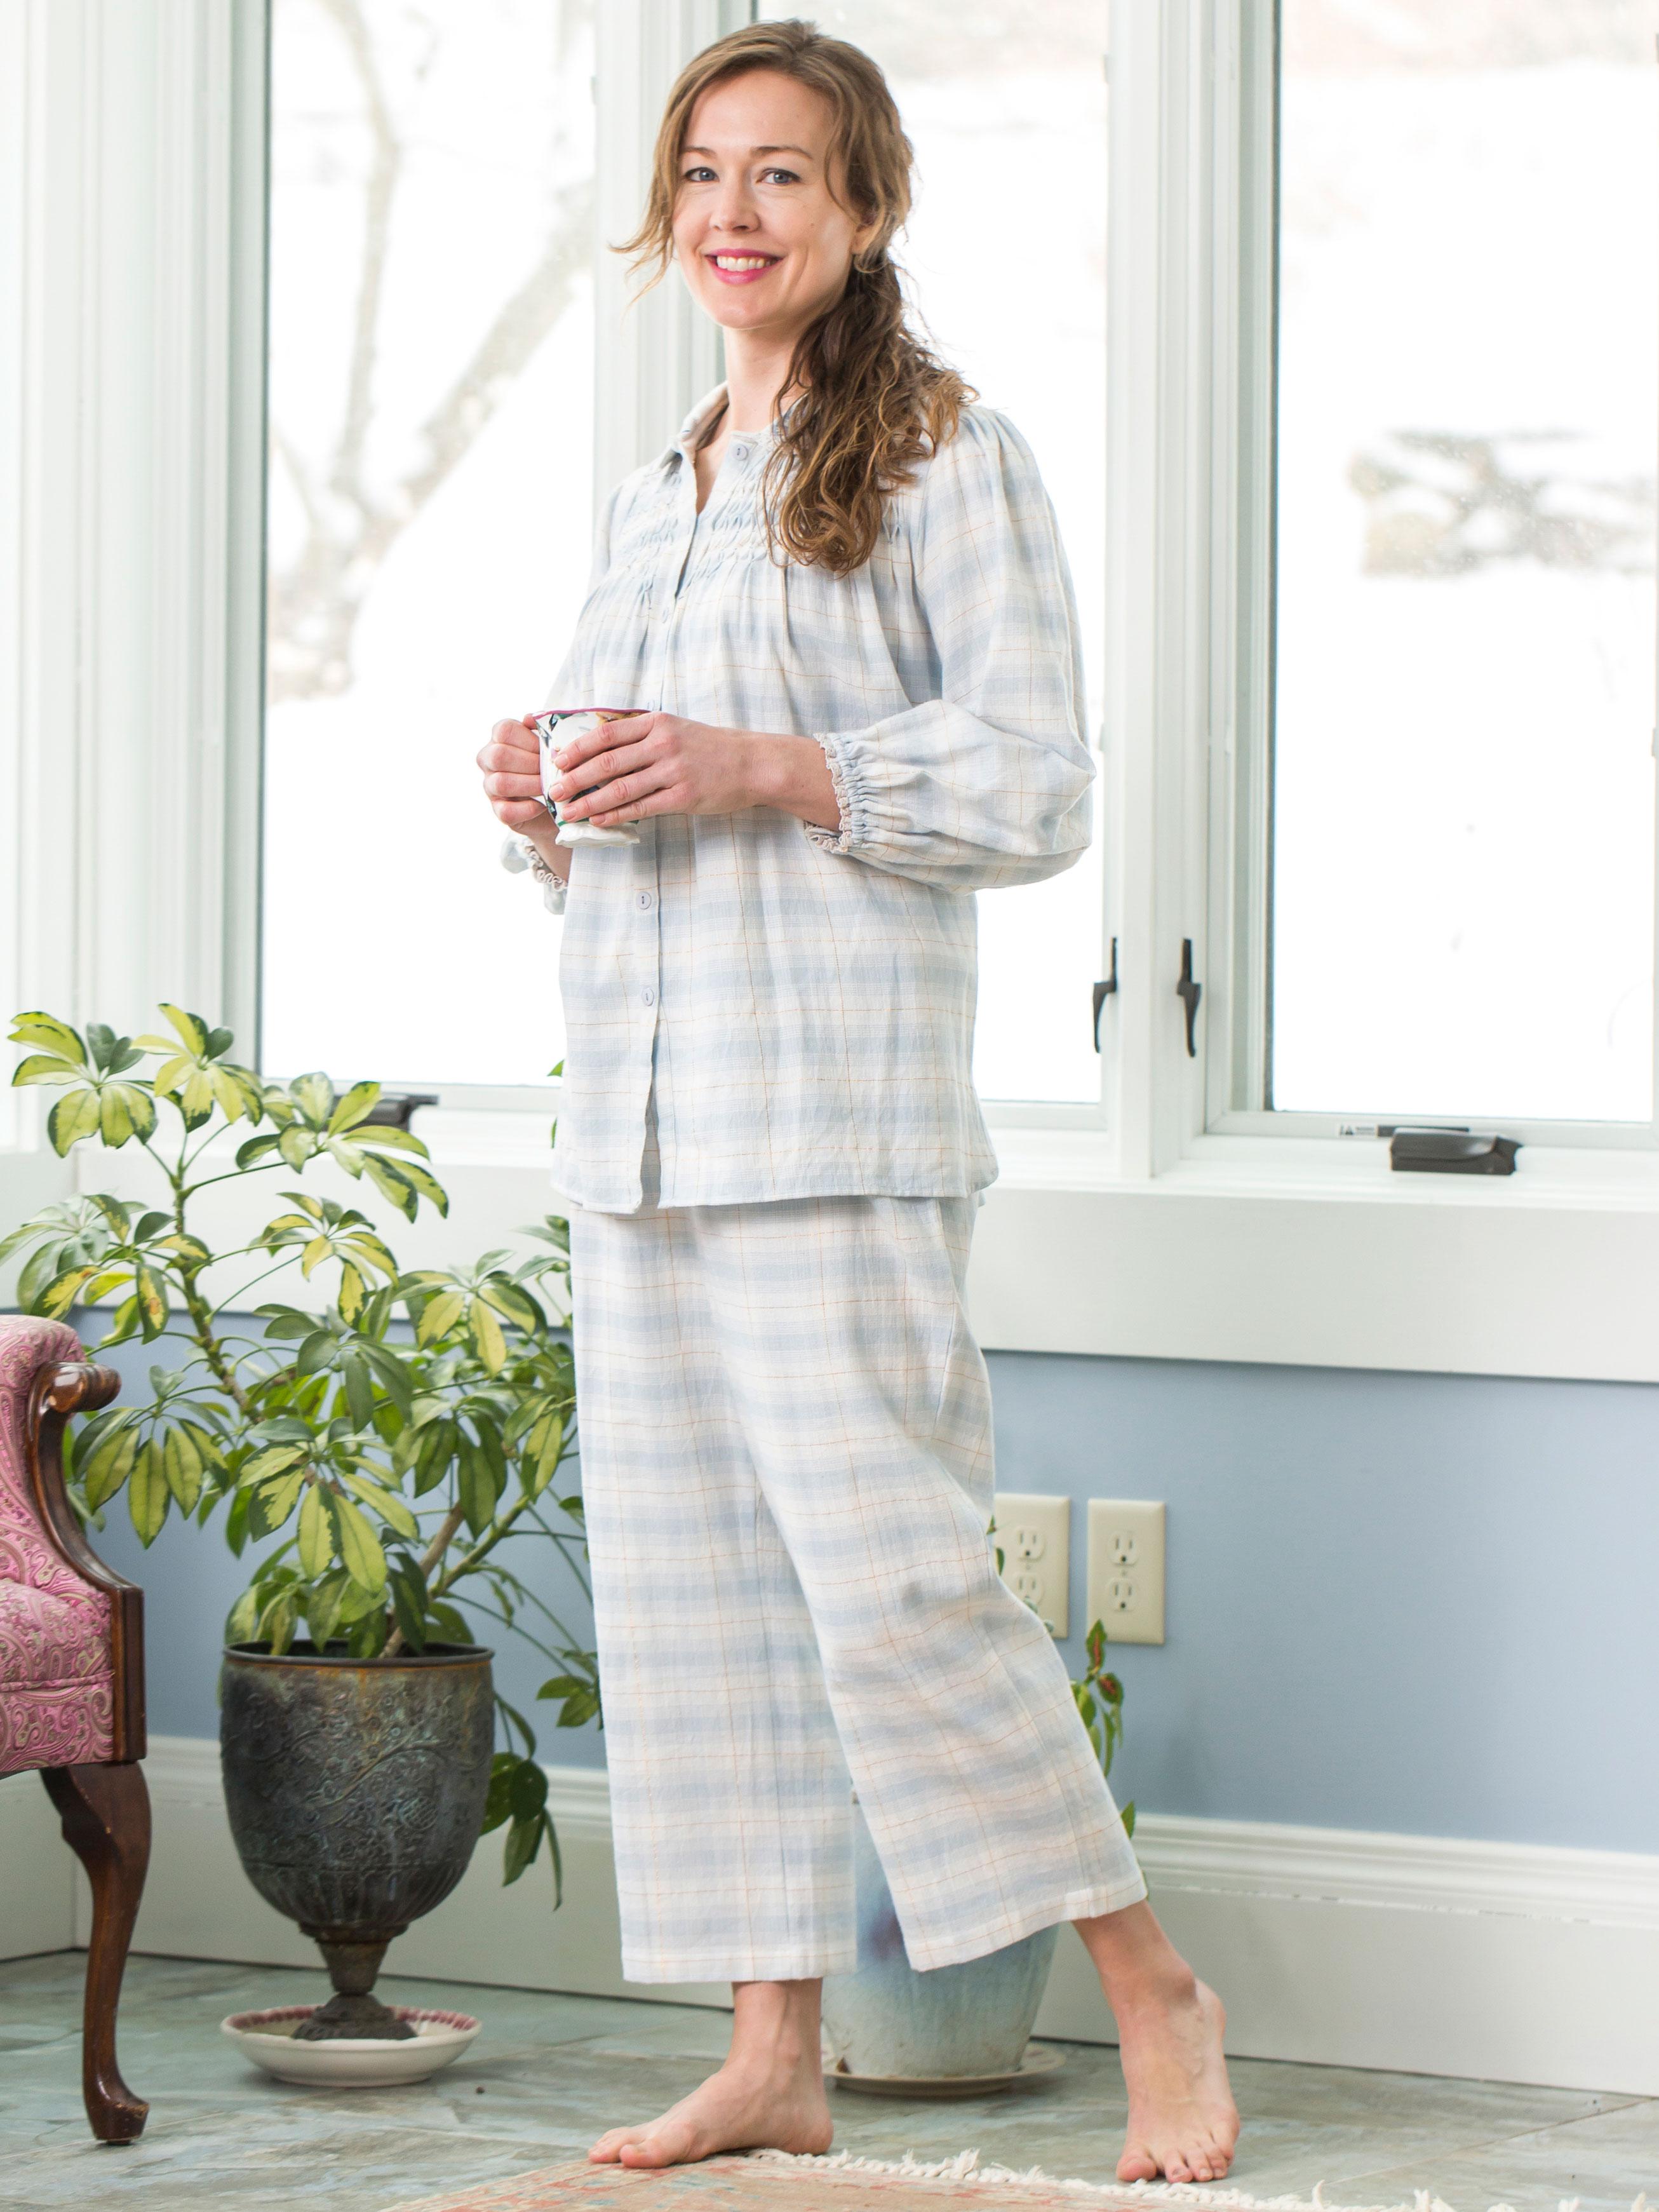 letts cuello cotton blue comfortable villela pijama pajama twill pajamas mao neckline dream most t en comforter celeste delantero light